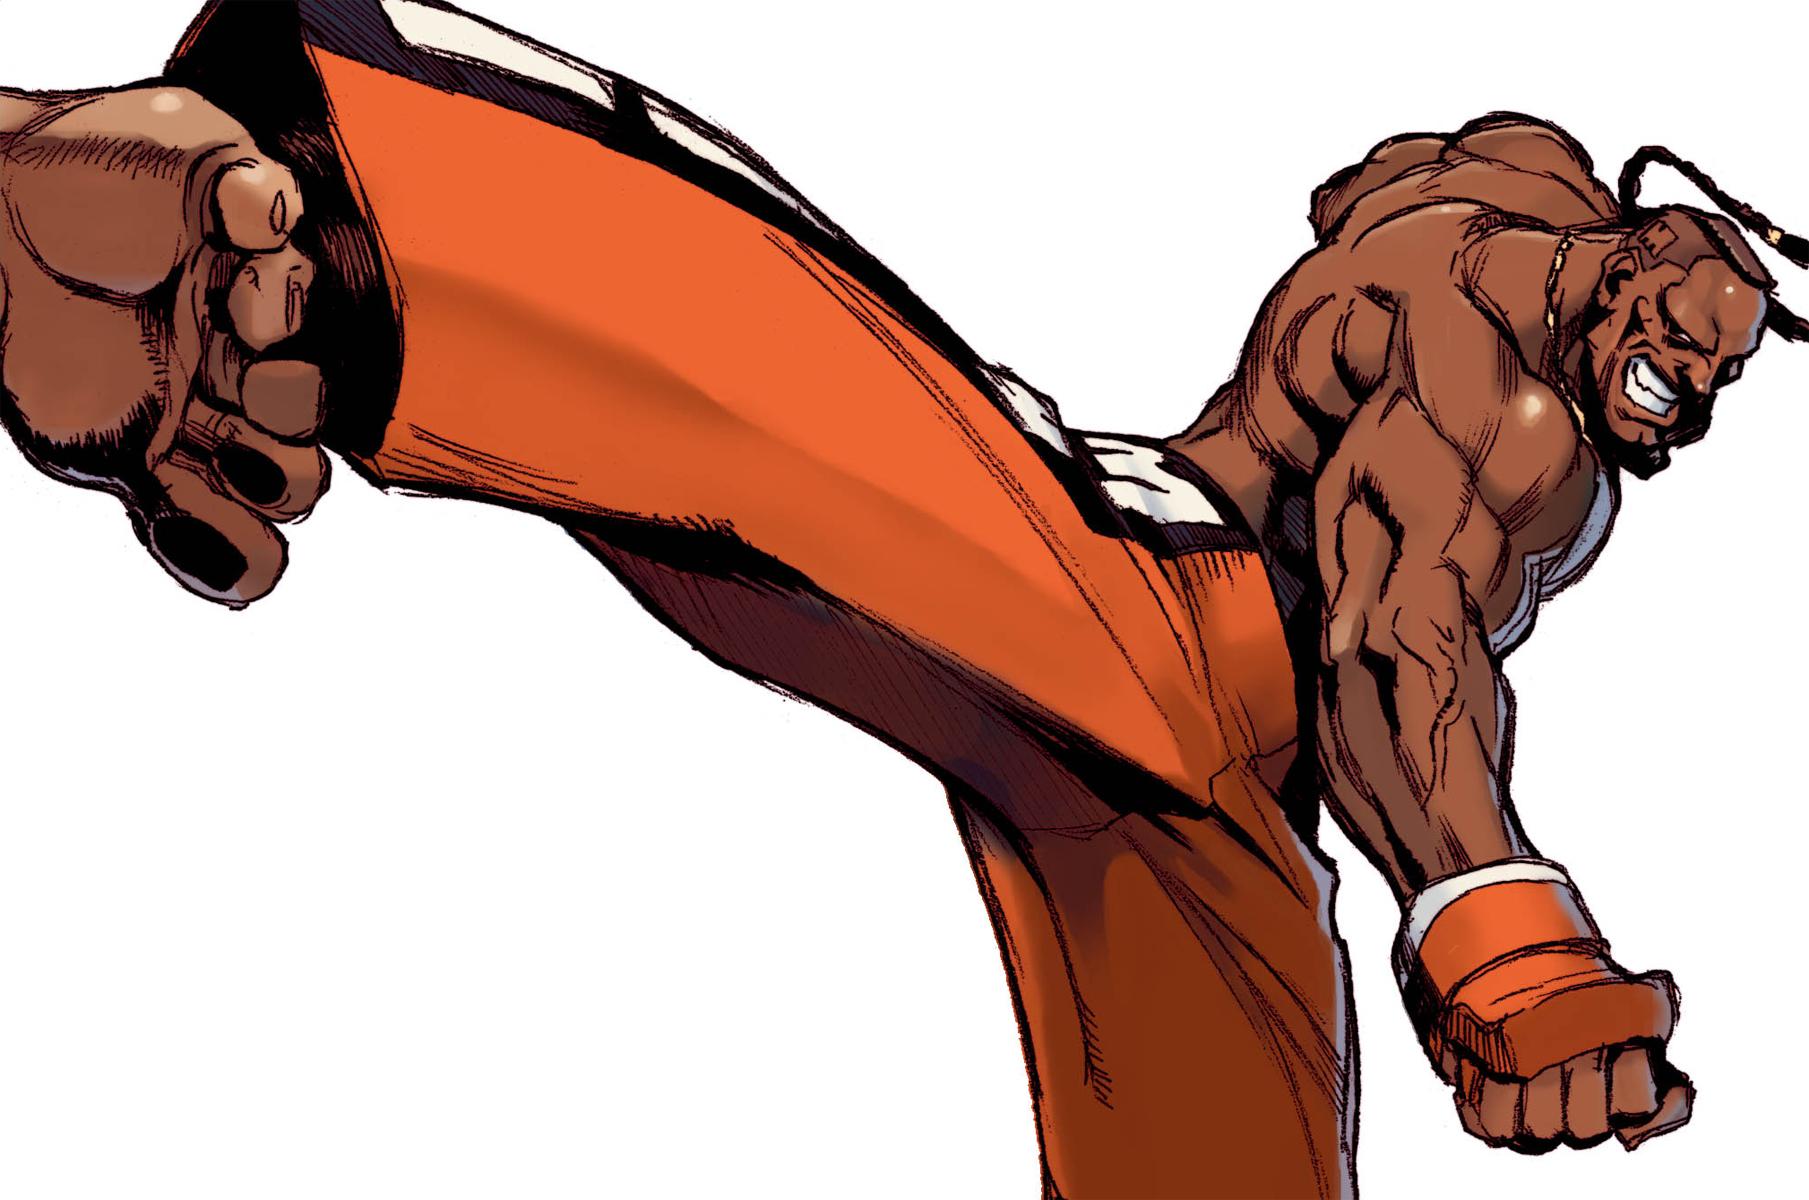 Super Street Fighter 2 Turbo Revival - Character Artwork. u003e